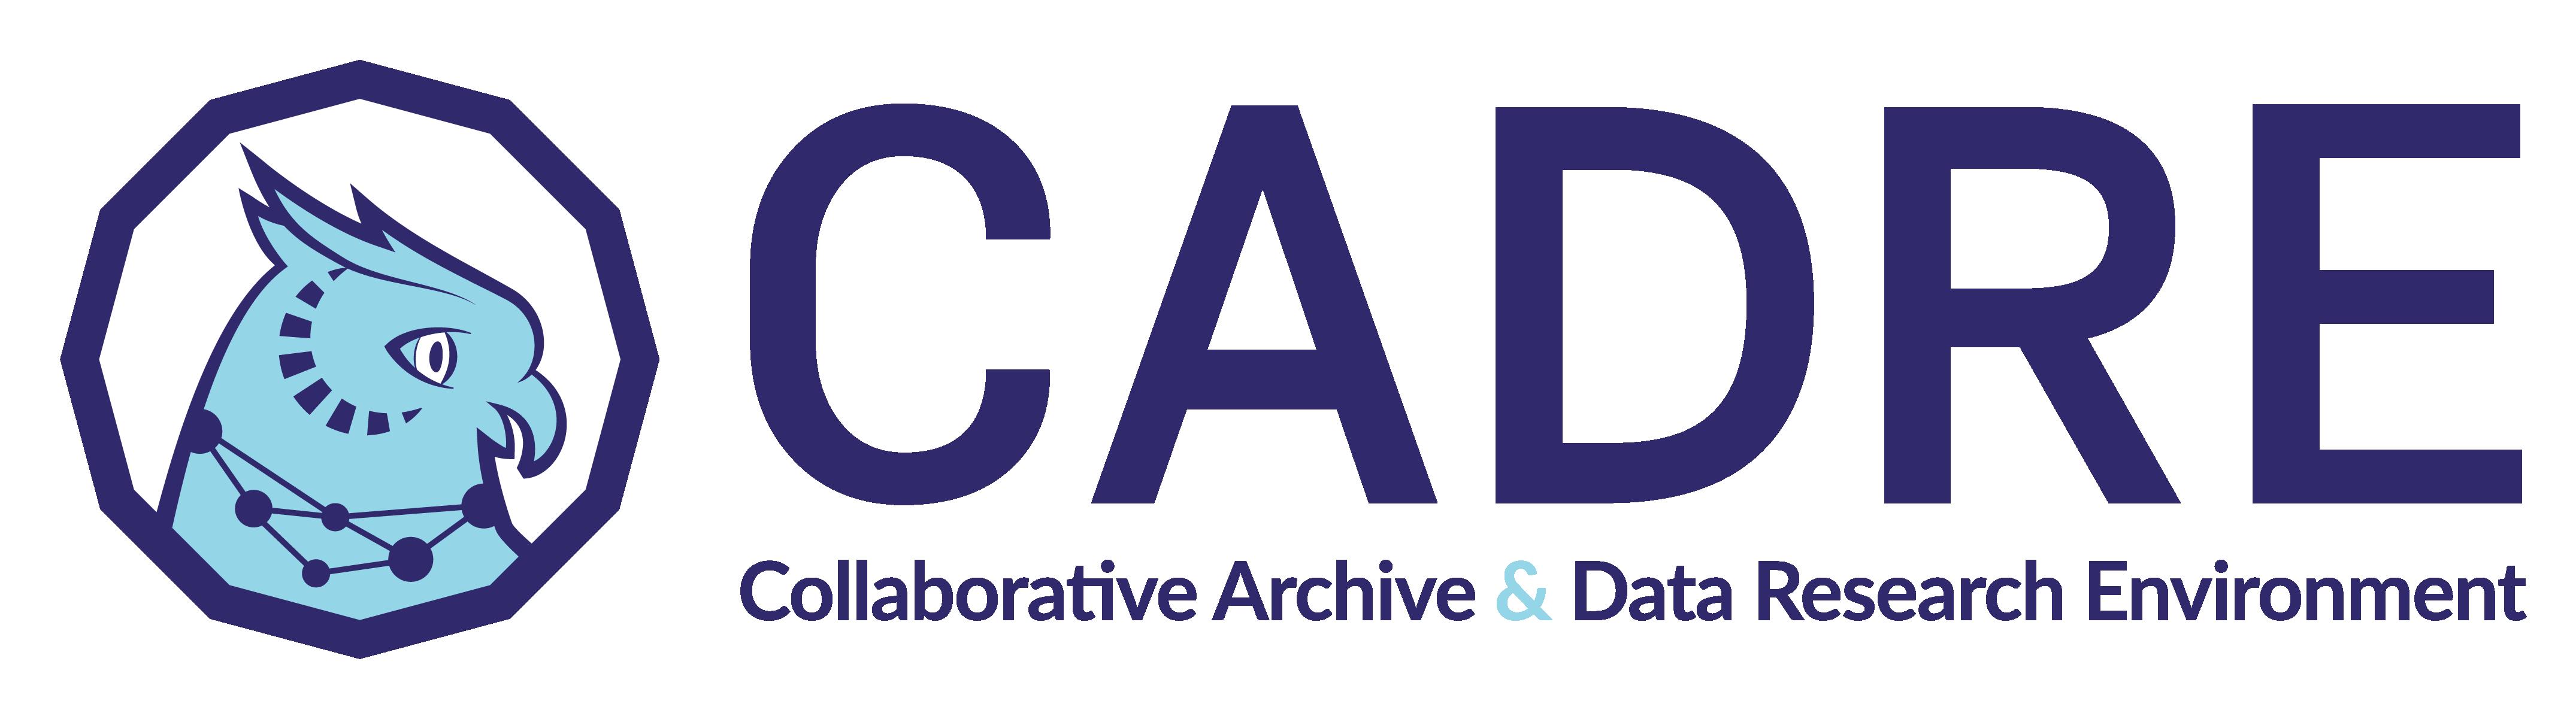 collaborative archive & data research environment logo